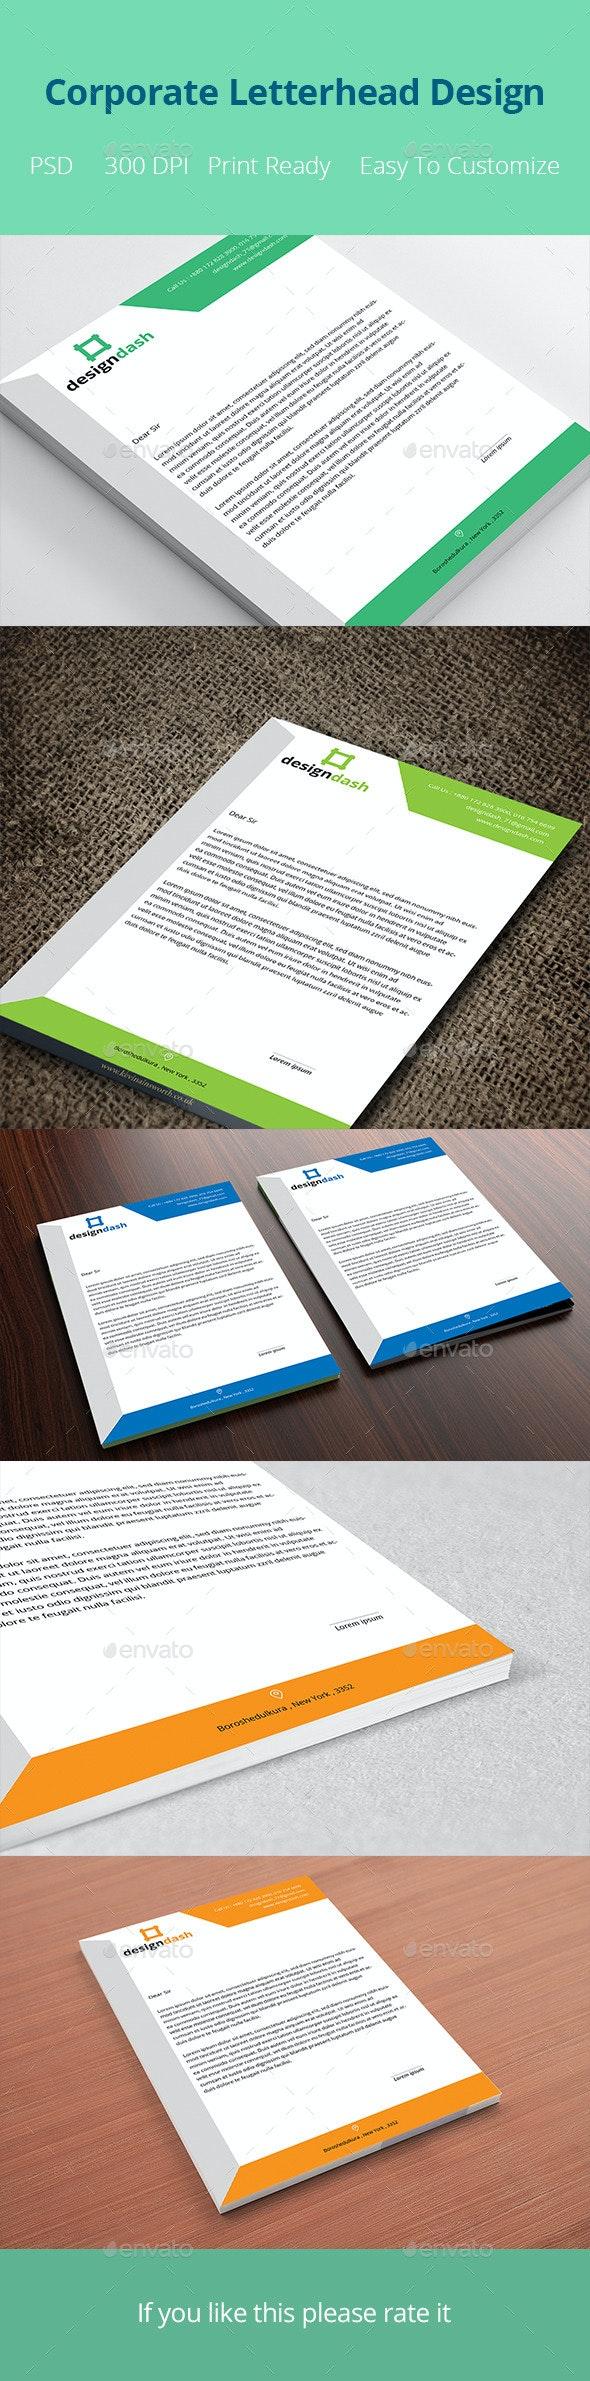 Corporate Letterhead Design Template - Stationery Print Templates